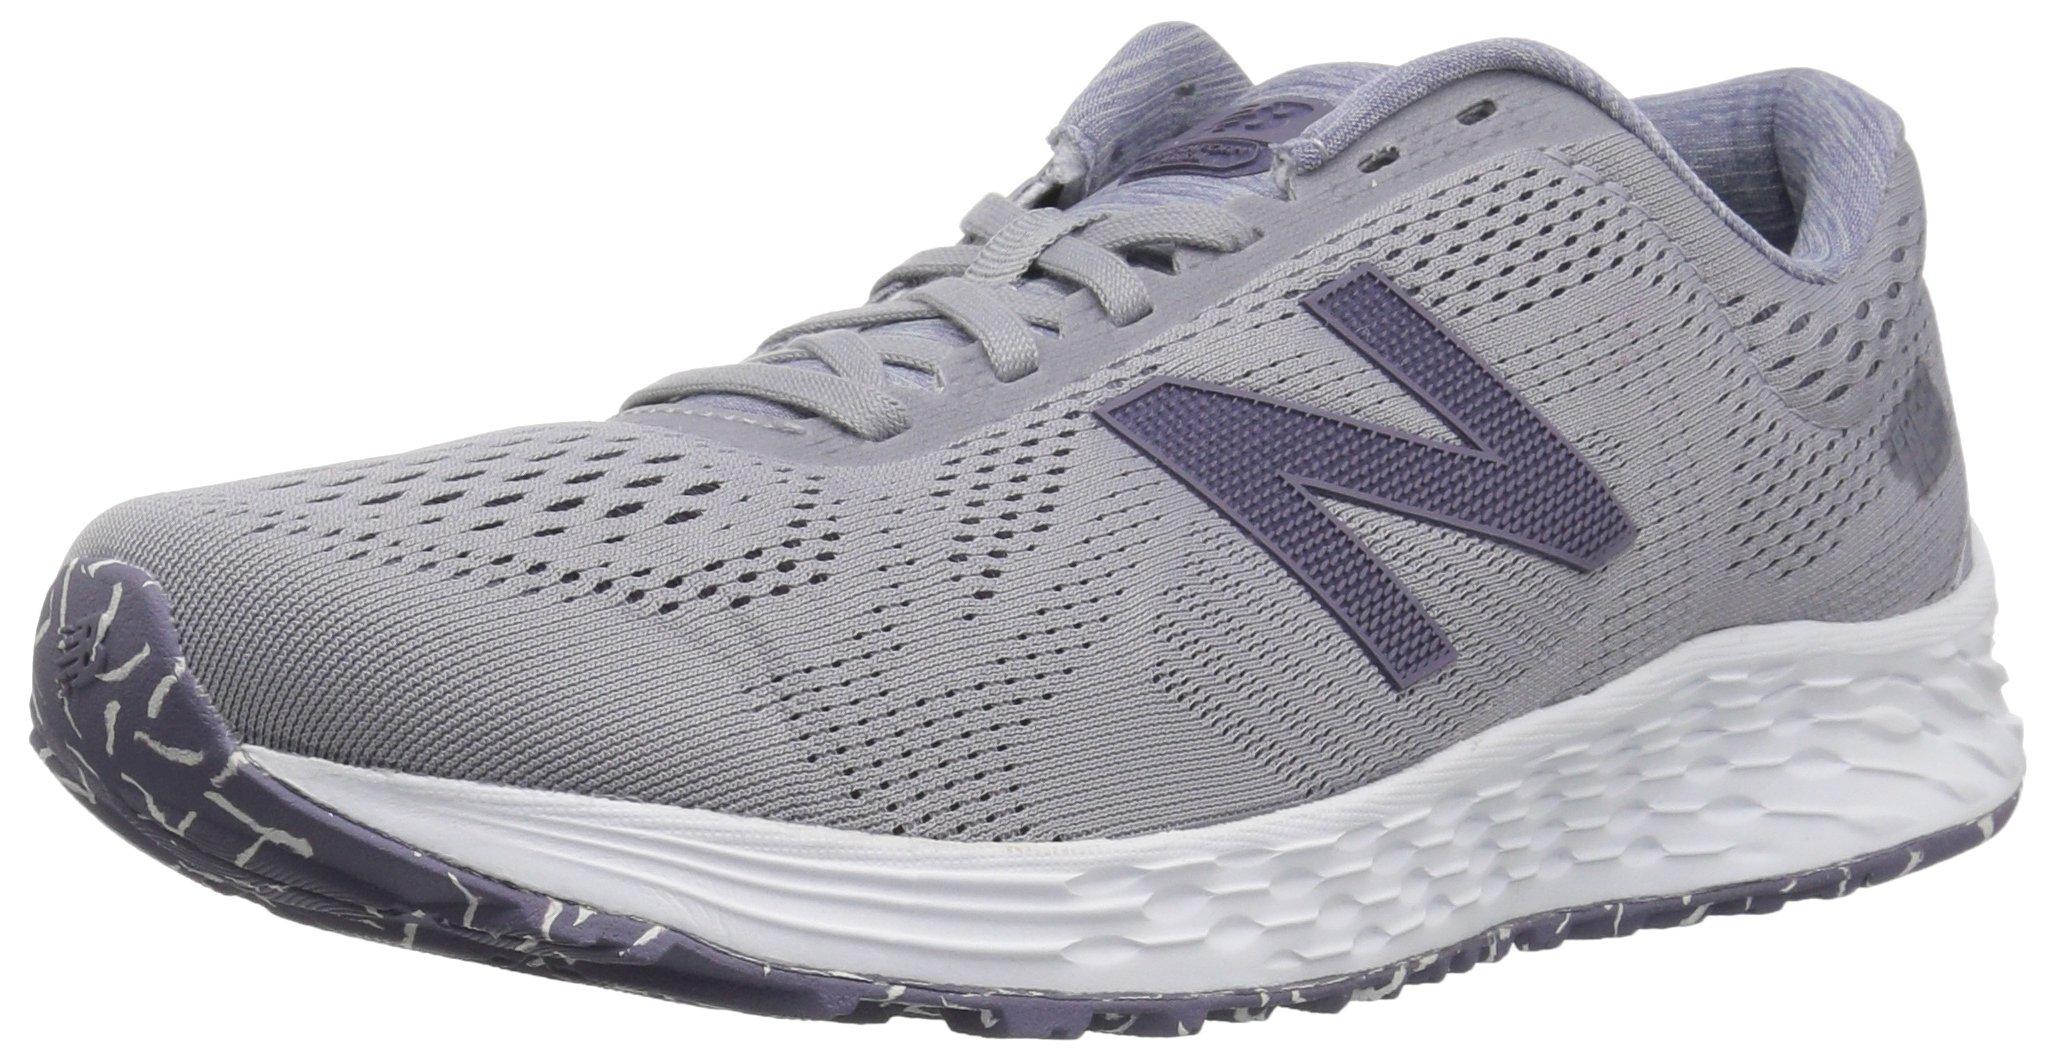 New Balance Women's Fresh Foam Arishi V1 Running Shoe, Light Grey/Purple, 5 B US